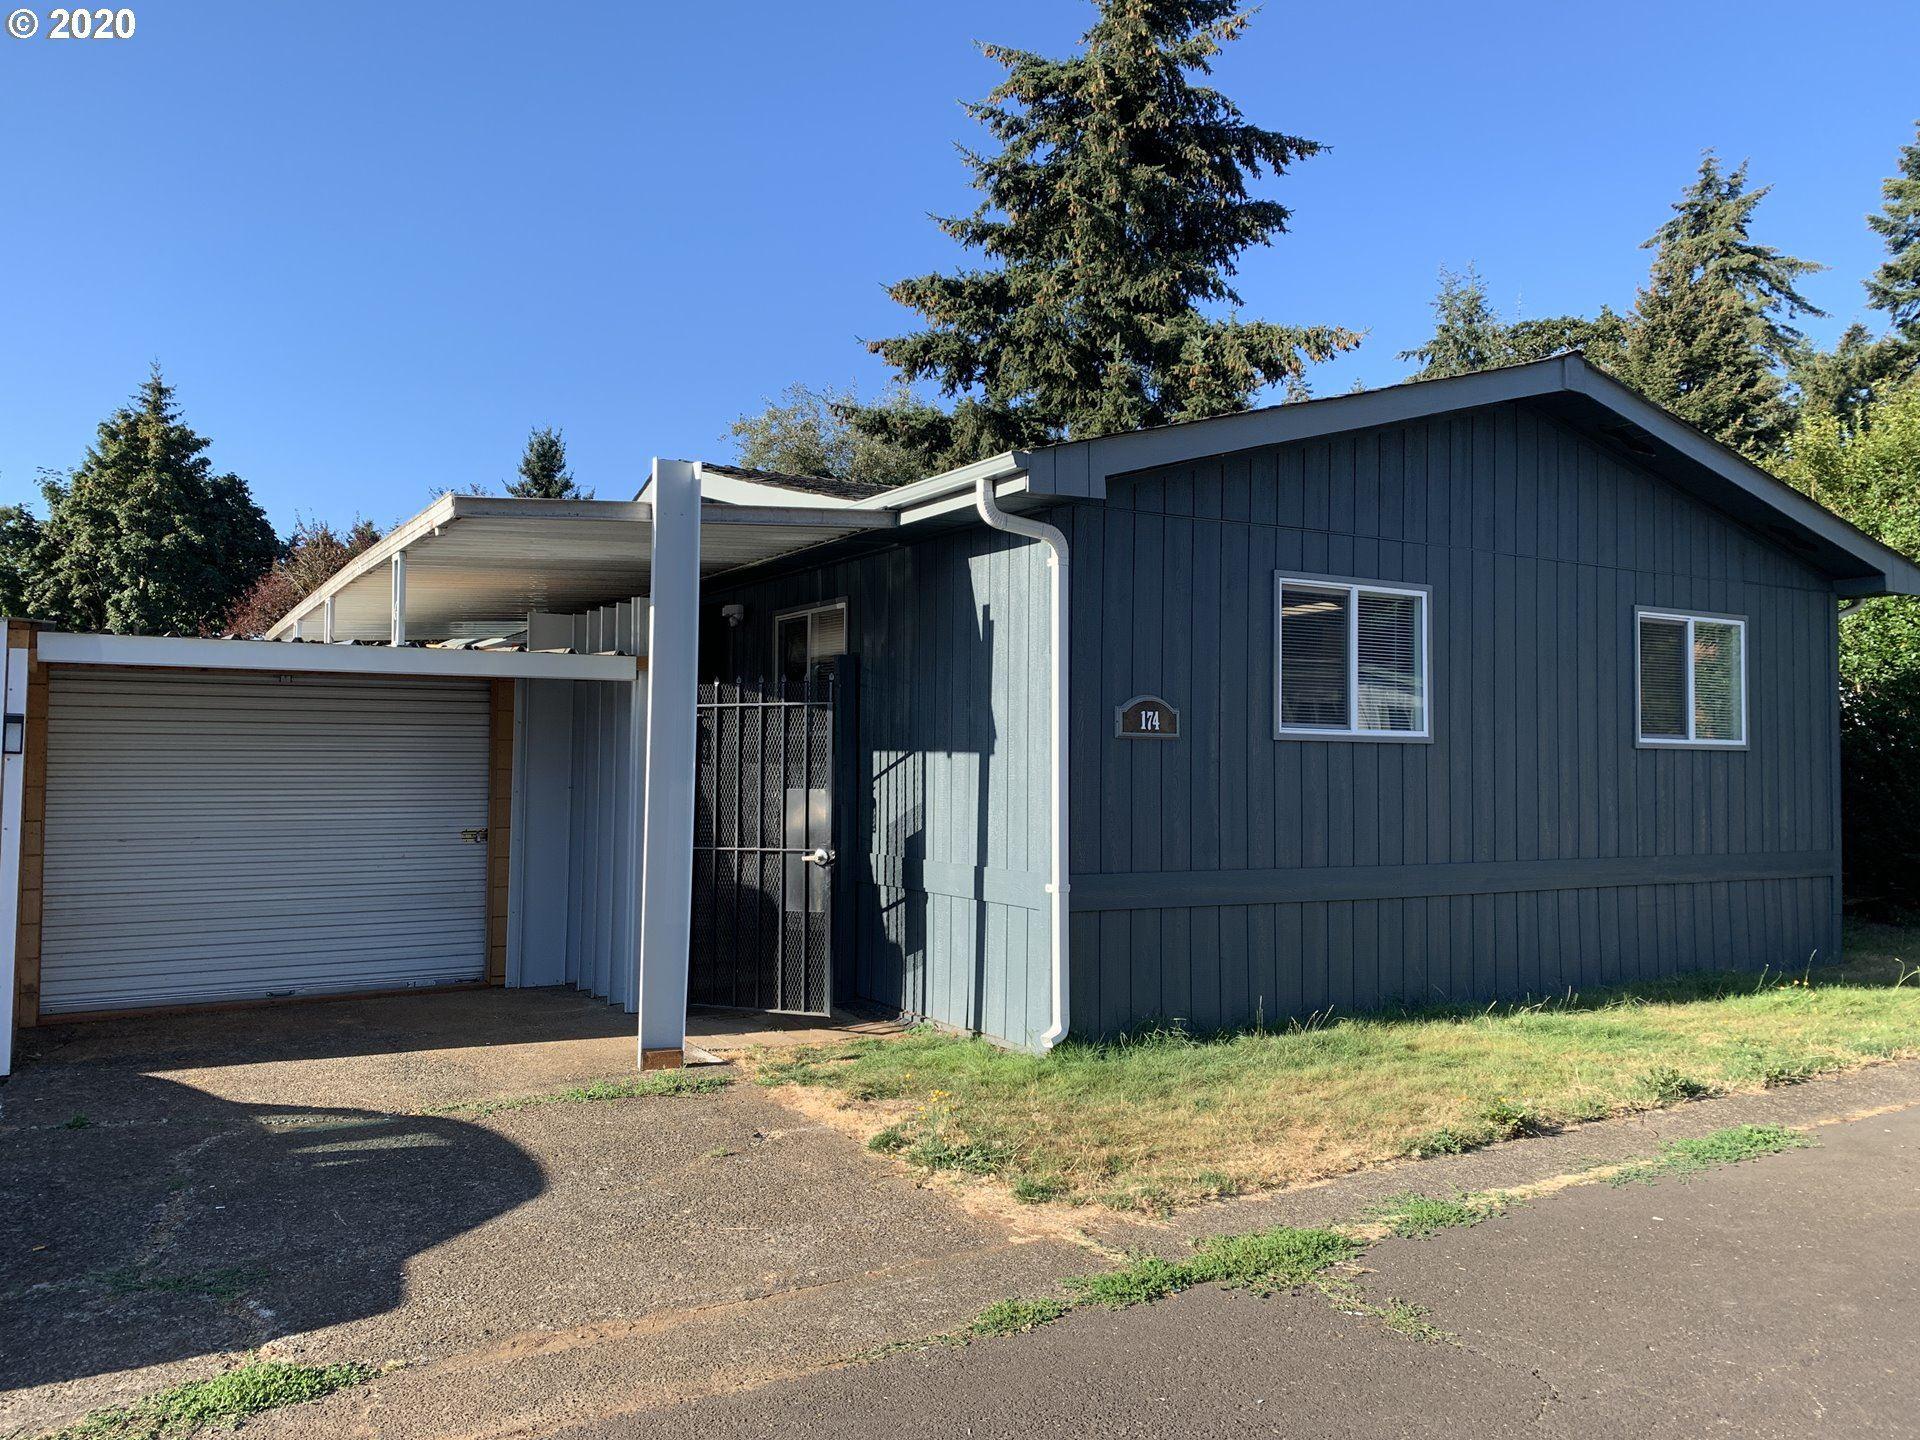 13531 CLAIRMONT WAY #174, Oregon City, OR 97045 - MLS#: 20310267